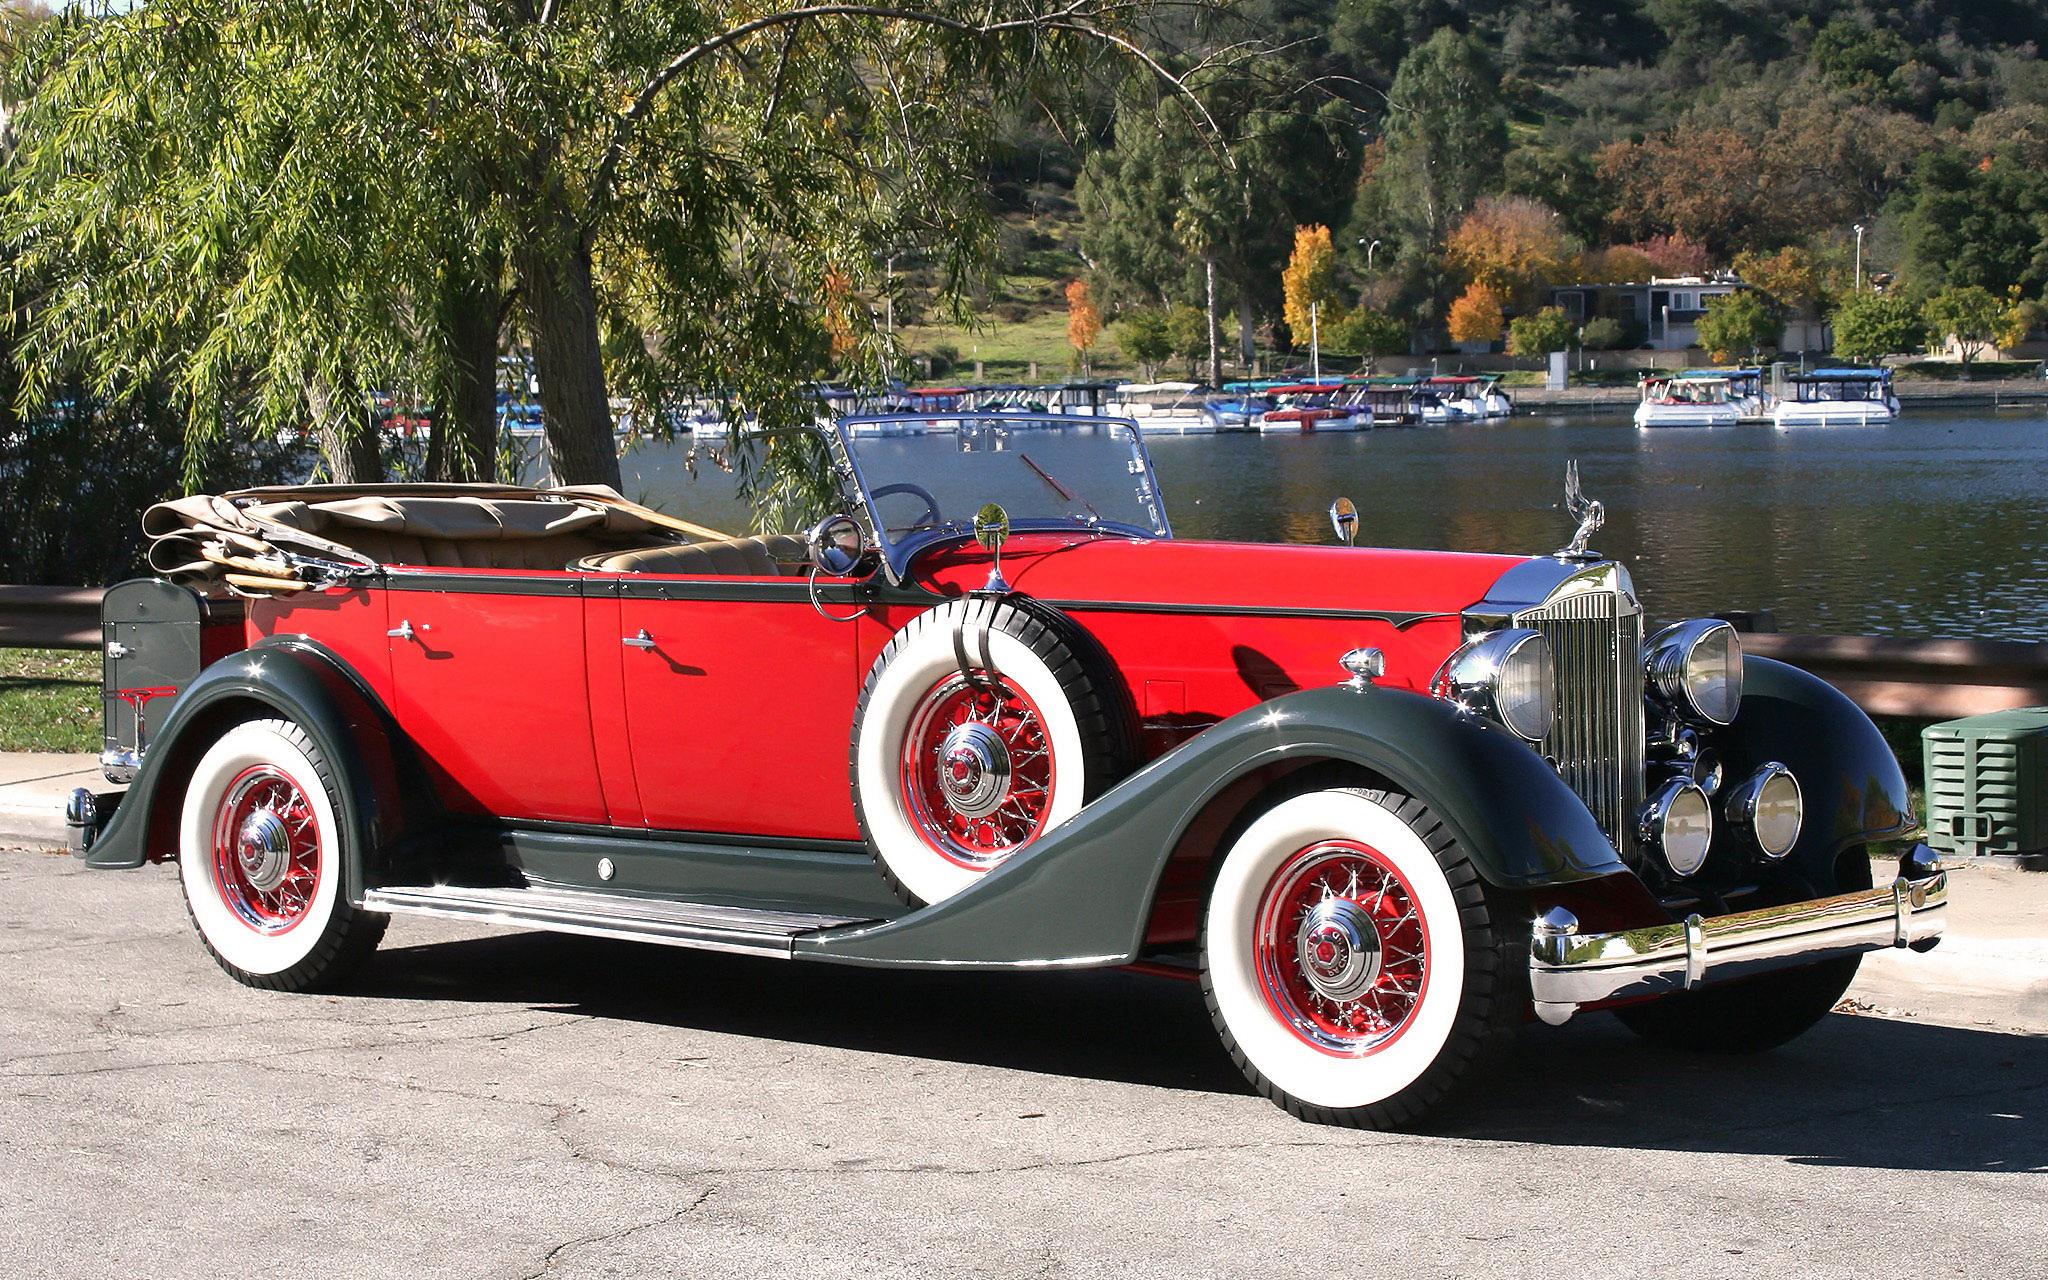 Wallpaper Red Vintage Vintage Car Classic Car Hot Rod Packard